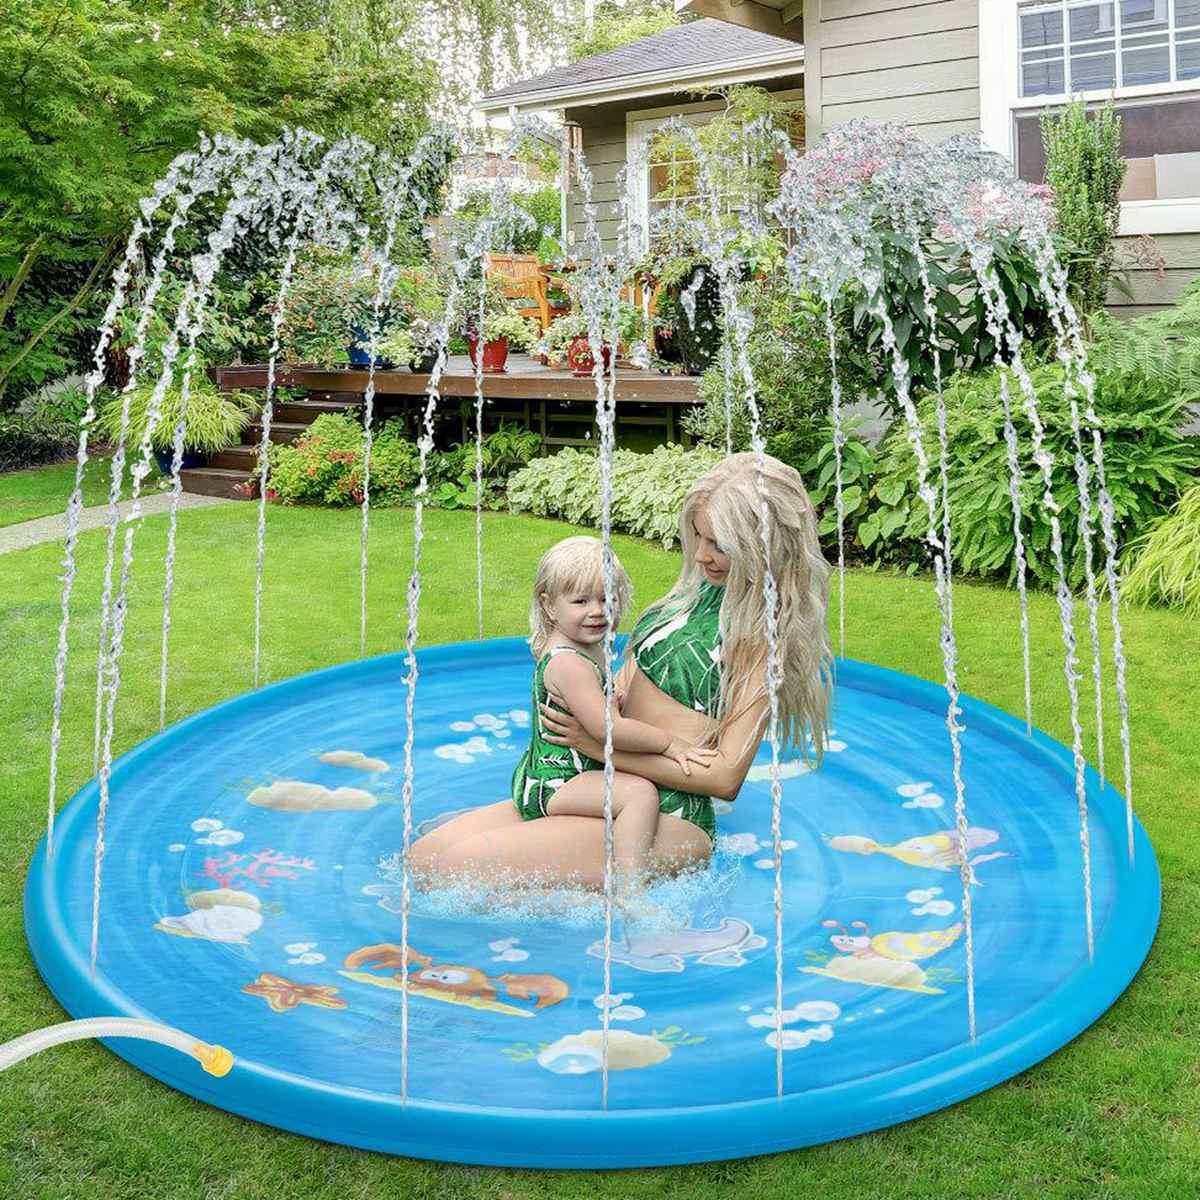 Kids Inflatable Round Water Splash Play Pool 100cm Playing Sprinkler Mat Yard Outdoor Fun Multicolour PVC Swimming Pools